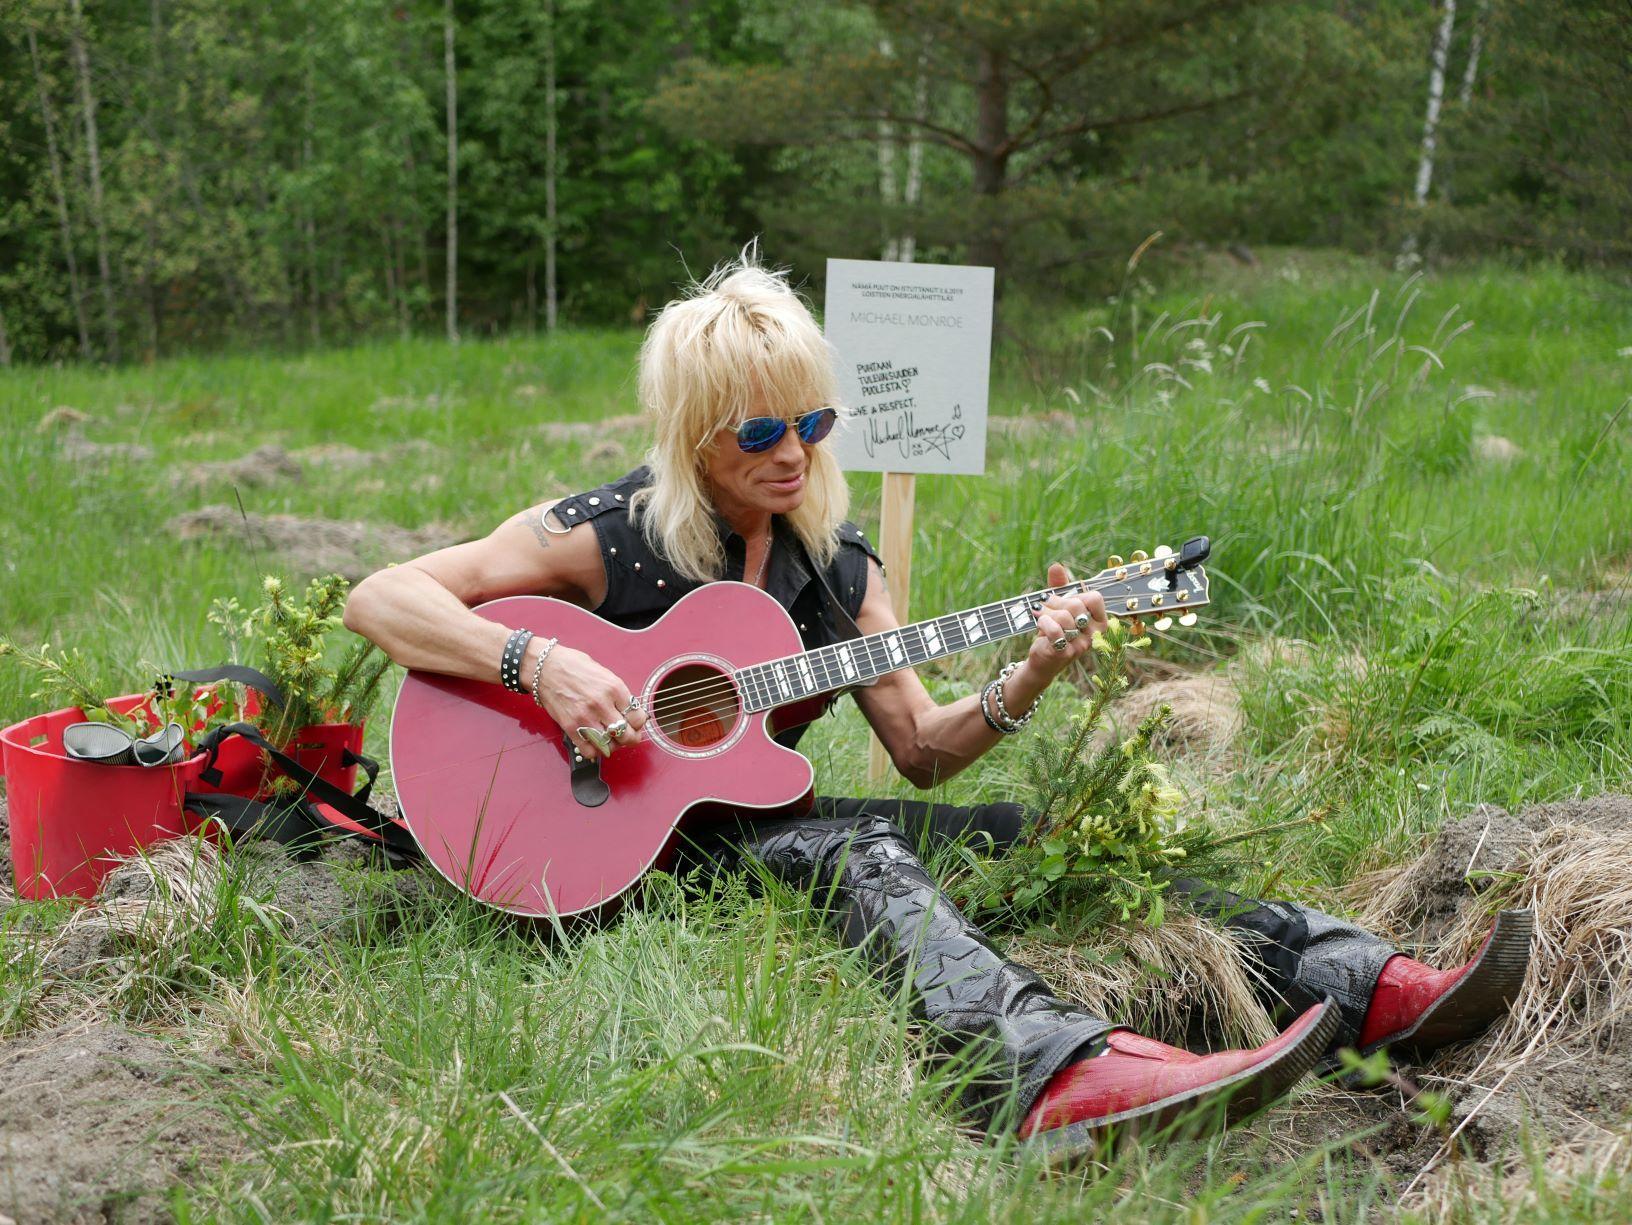 Rockartisten Monroe sitter i gräset